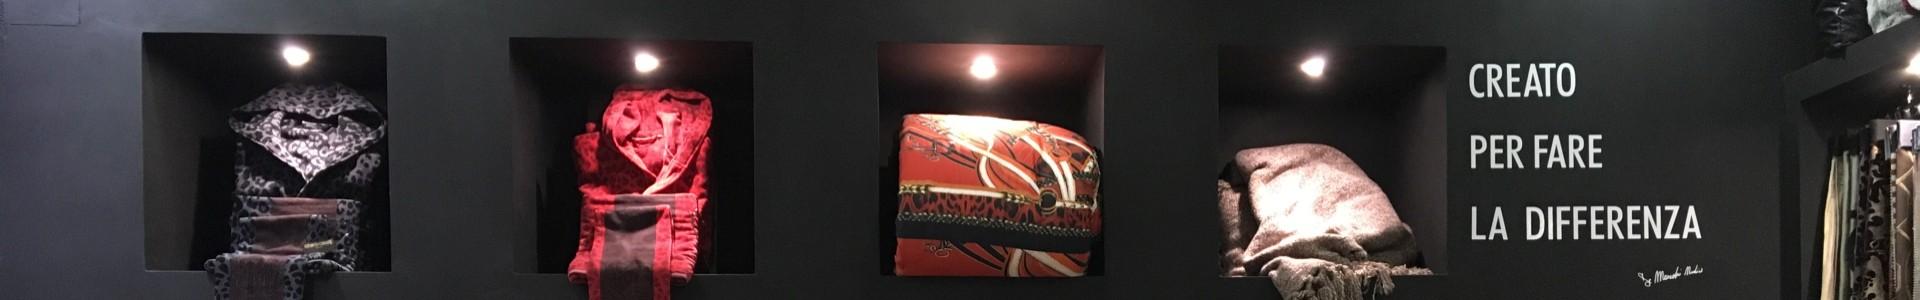 tendaggi e tessuti latina - showroom nadia de marchi